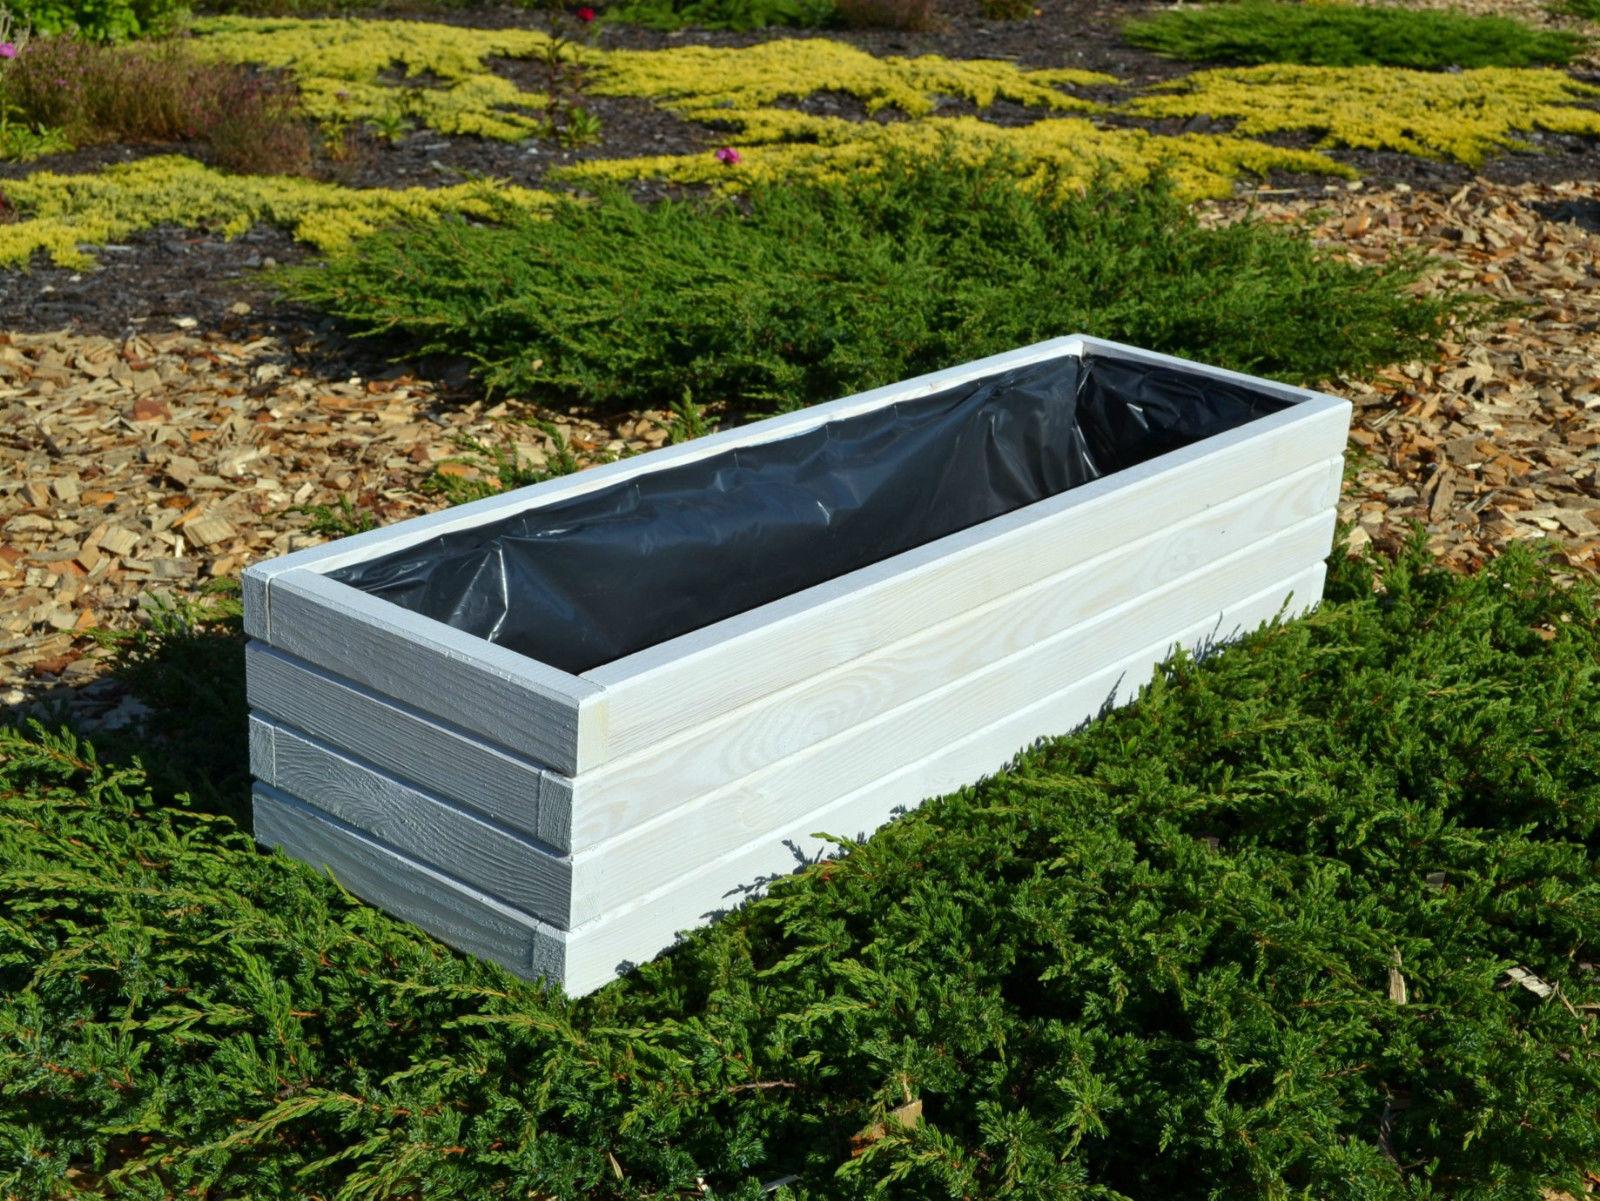 pflanzk bel holz d2 pflanzkasten 80 100 cm xxl grau wei. Black Bedroom Furniture Sets. Home Design Ideas